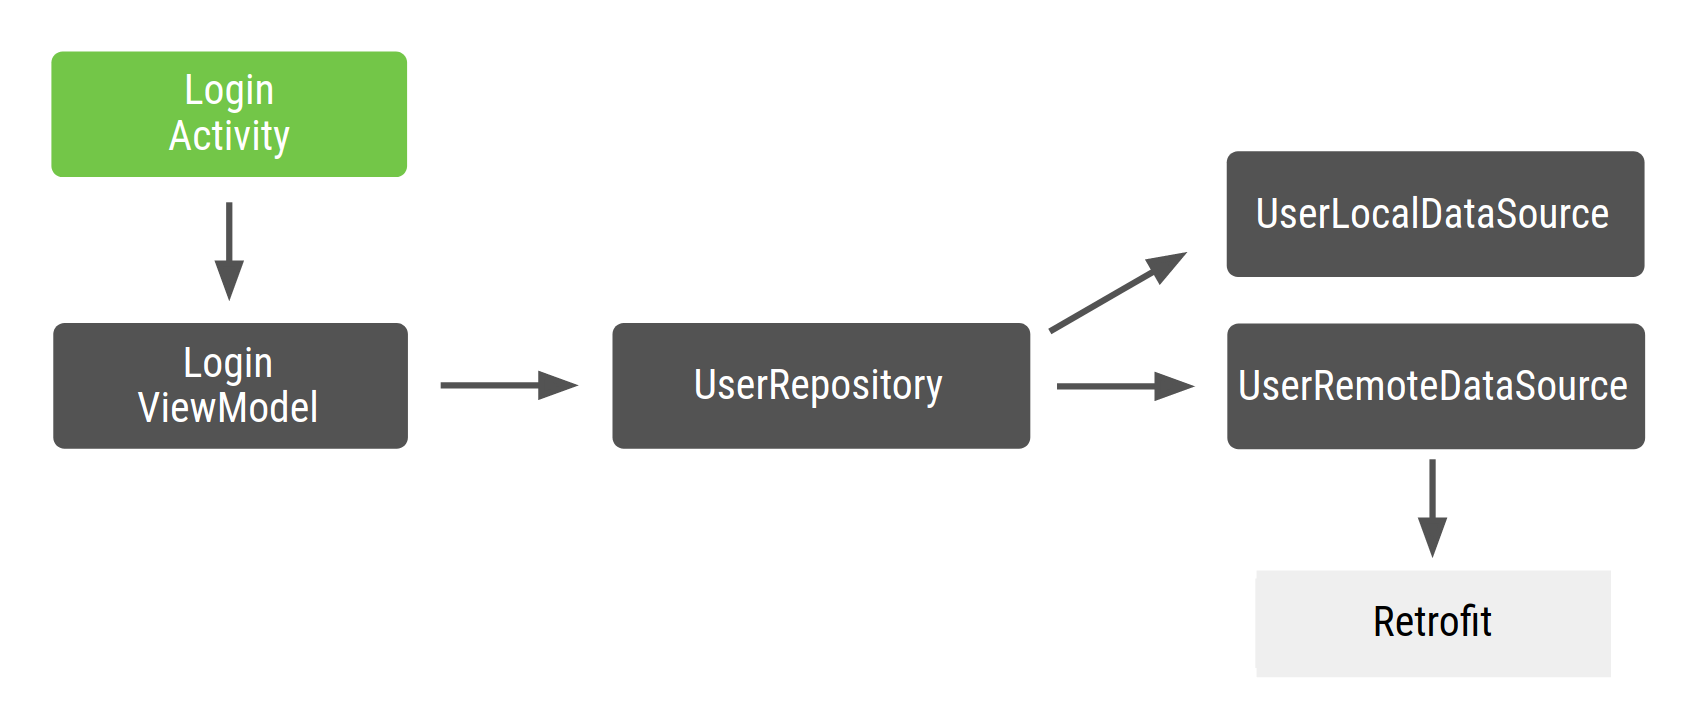 LoginActivity 依赖于 LoginViewModel,LoginViewModel 依赖于 UserRepository,UserRepository 依赖于 UserLocalDataSource 和 UserRemoteDataSource,而 UserRemoteDataSource 又依赖于 Retrofit。